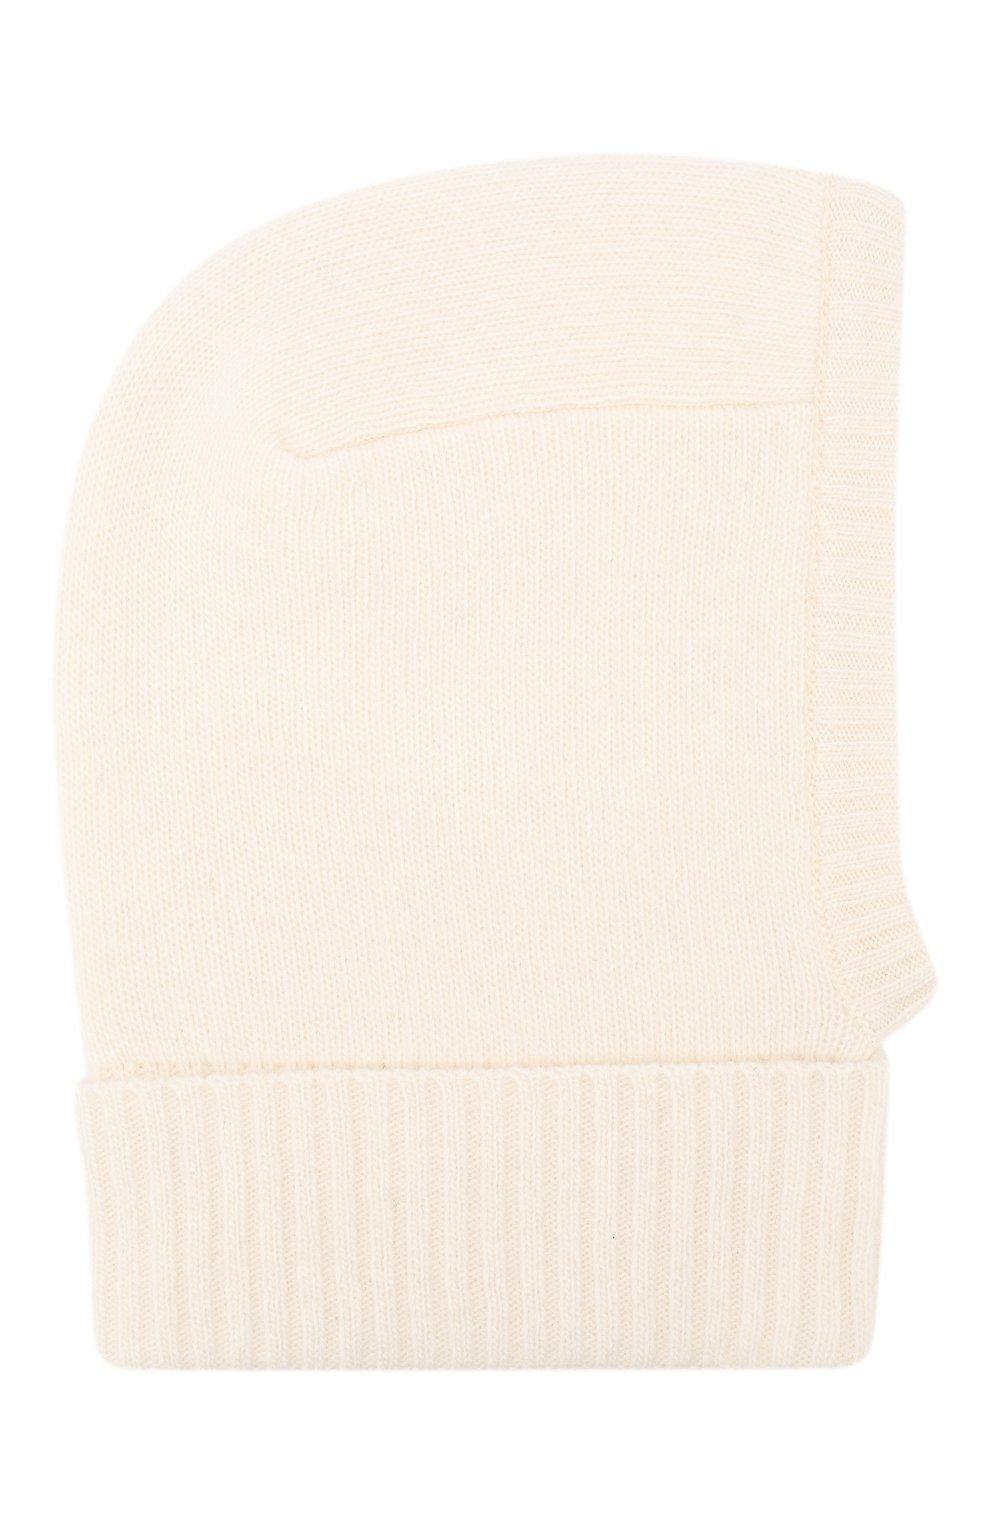 Детского шапка-балаклава из шерсти и кашемира IL TRENINO белого цвета, арт. 18 7529/E0 | Фото 1